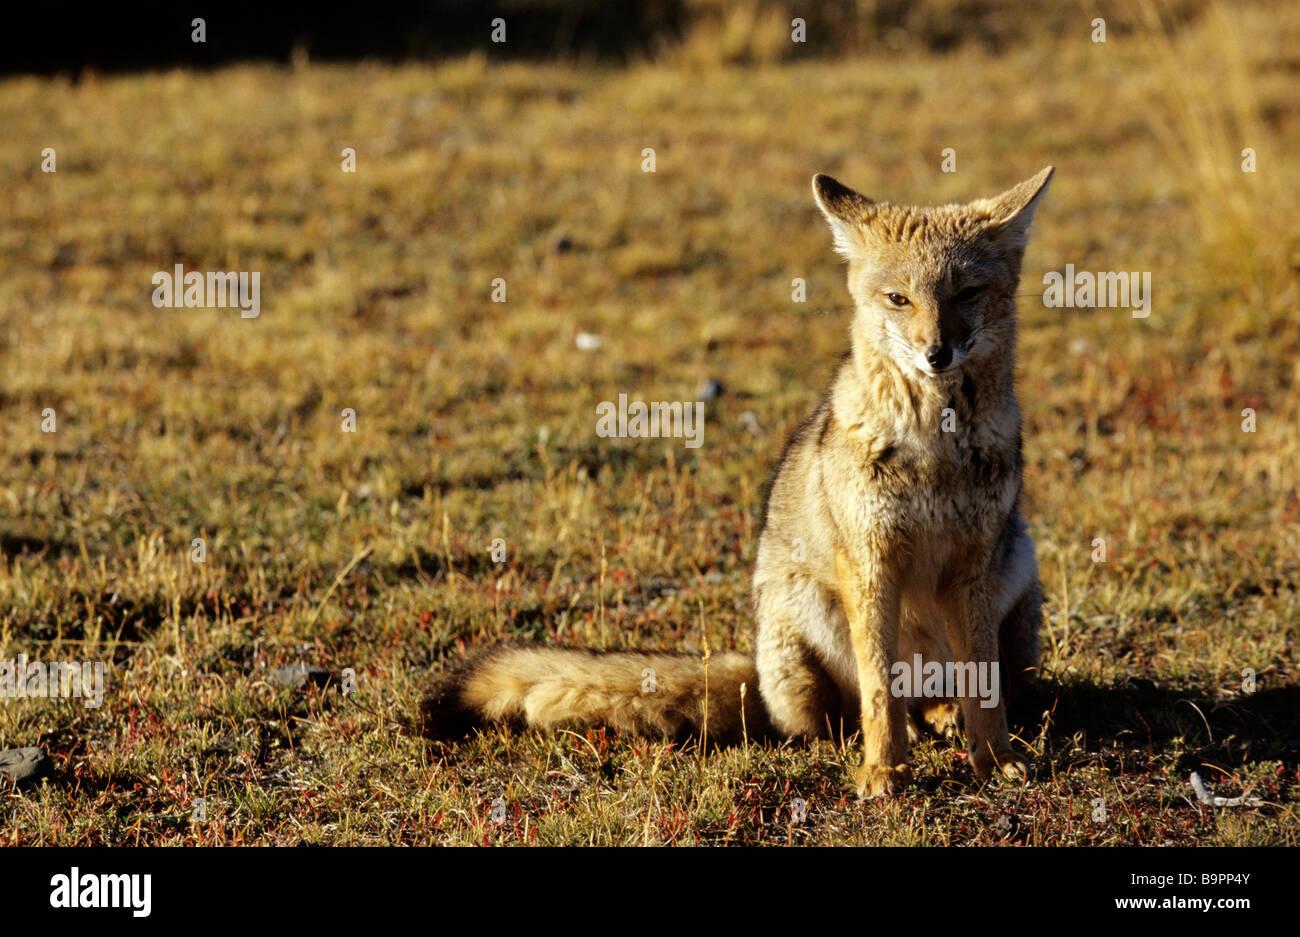 Chile, Patagonia, Magellan Region, Torres del Paine National Park, fox - Stock Image